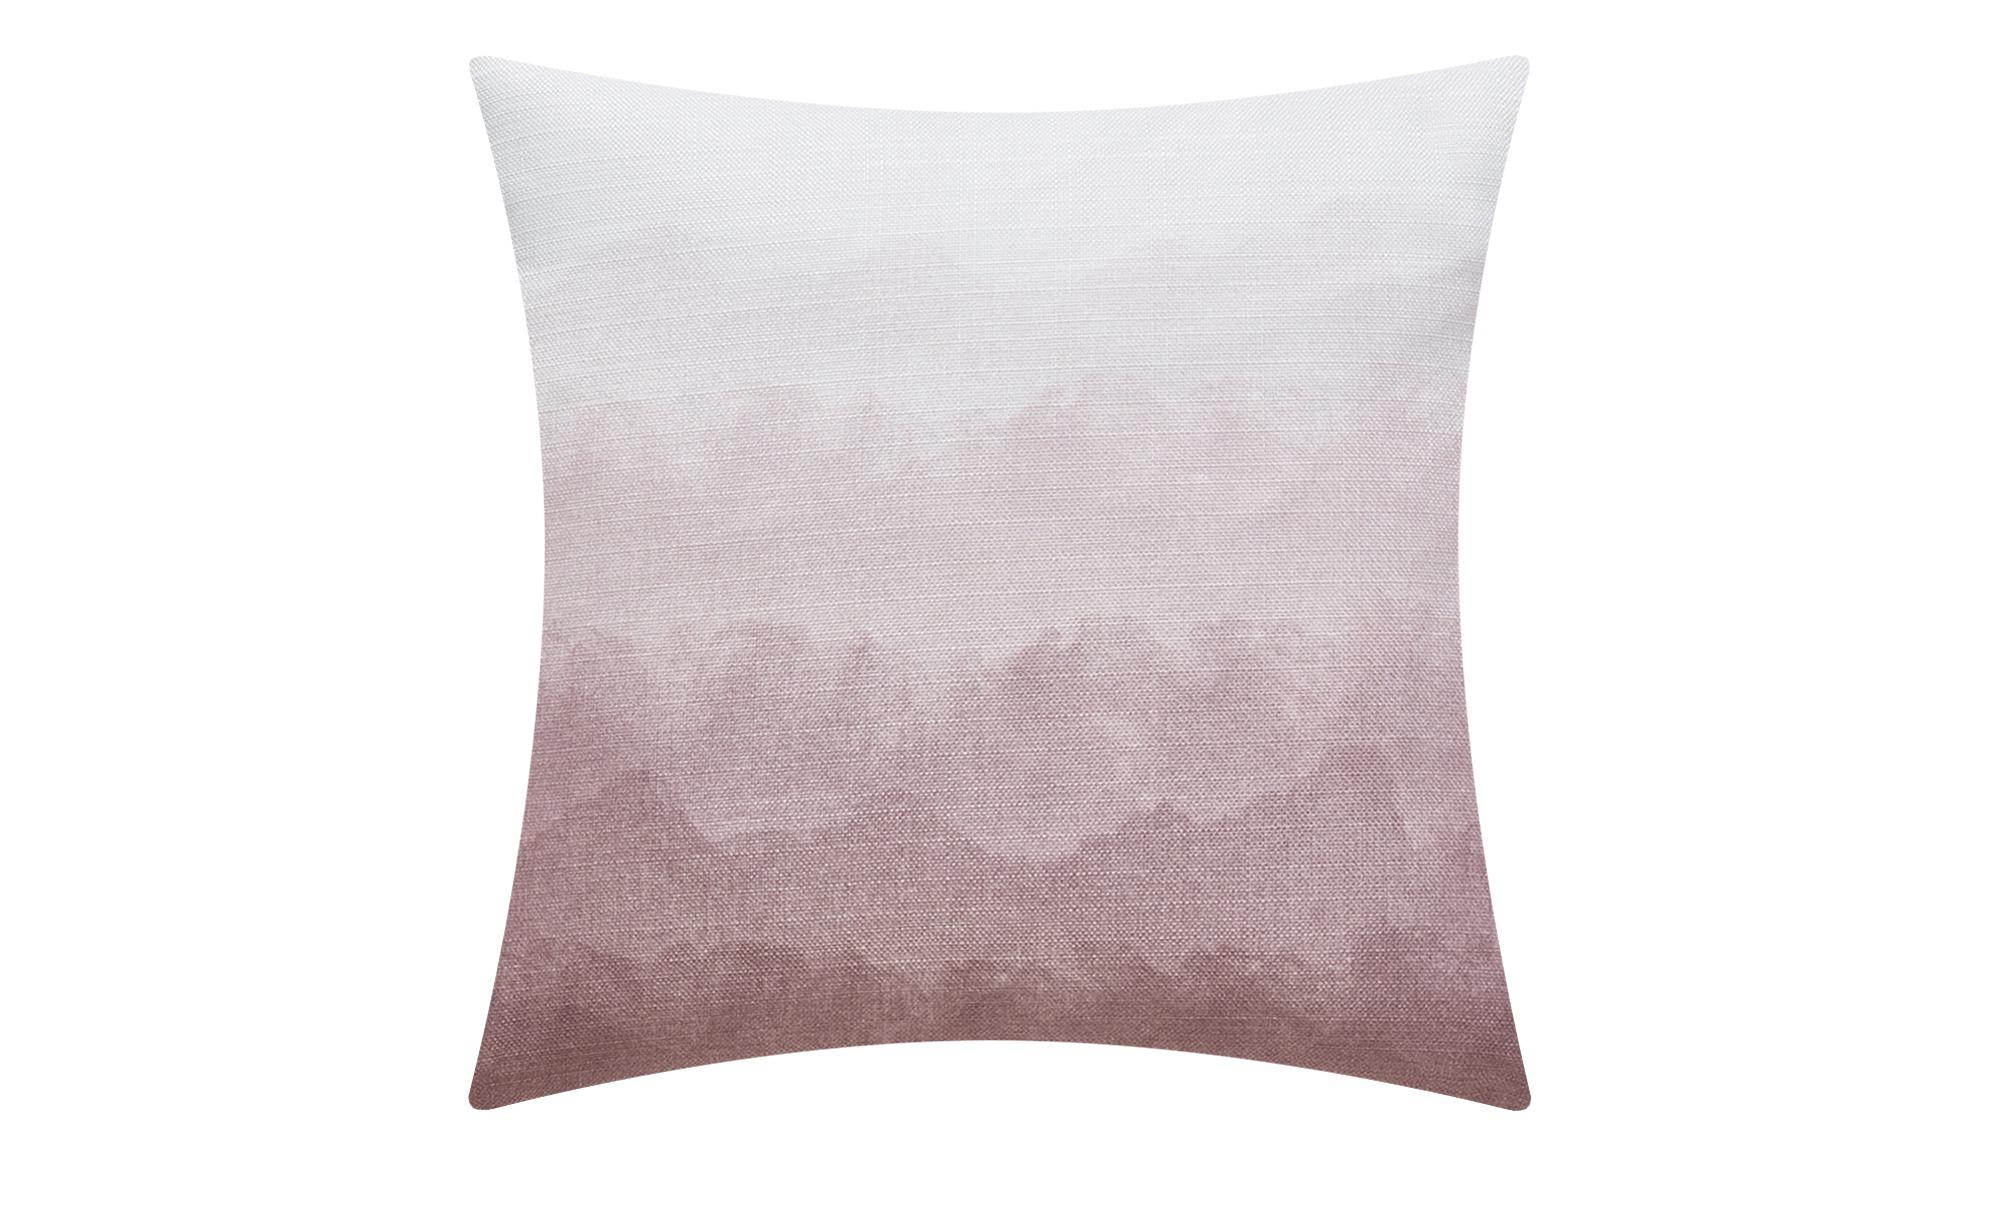 HOME STORY Kissen  Batik ¦ lila/violett ¦ 100% Polyesterfüllung ¦ Maße (cm): B: 48 Heimtextilien > Kissen > Dekokissen - Höffner